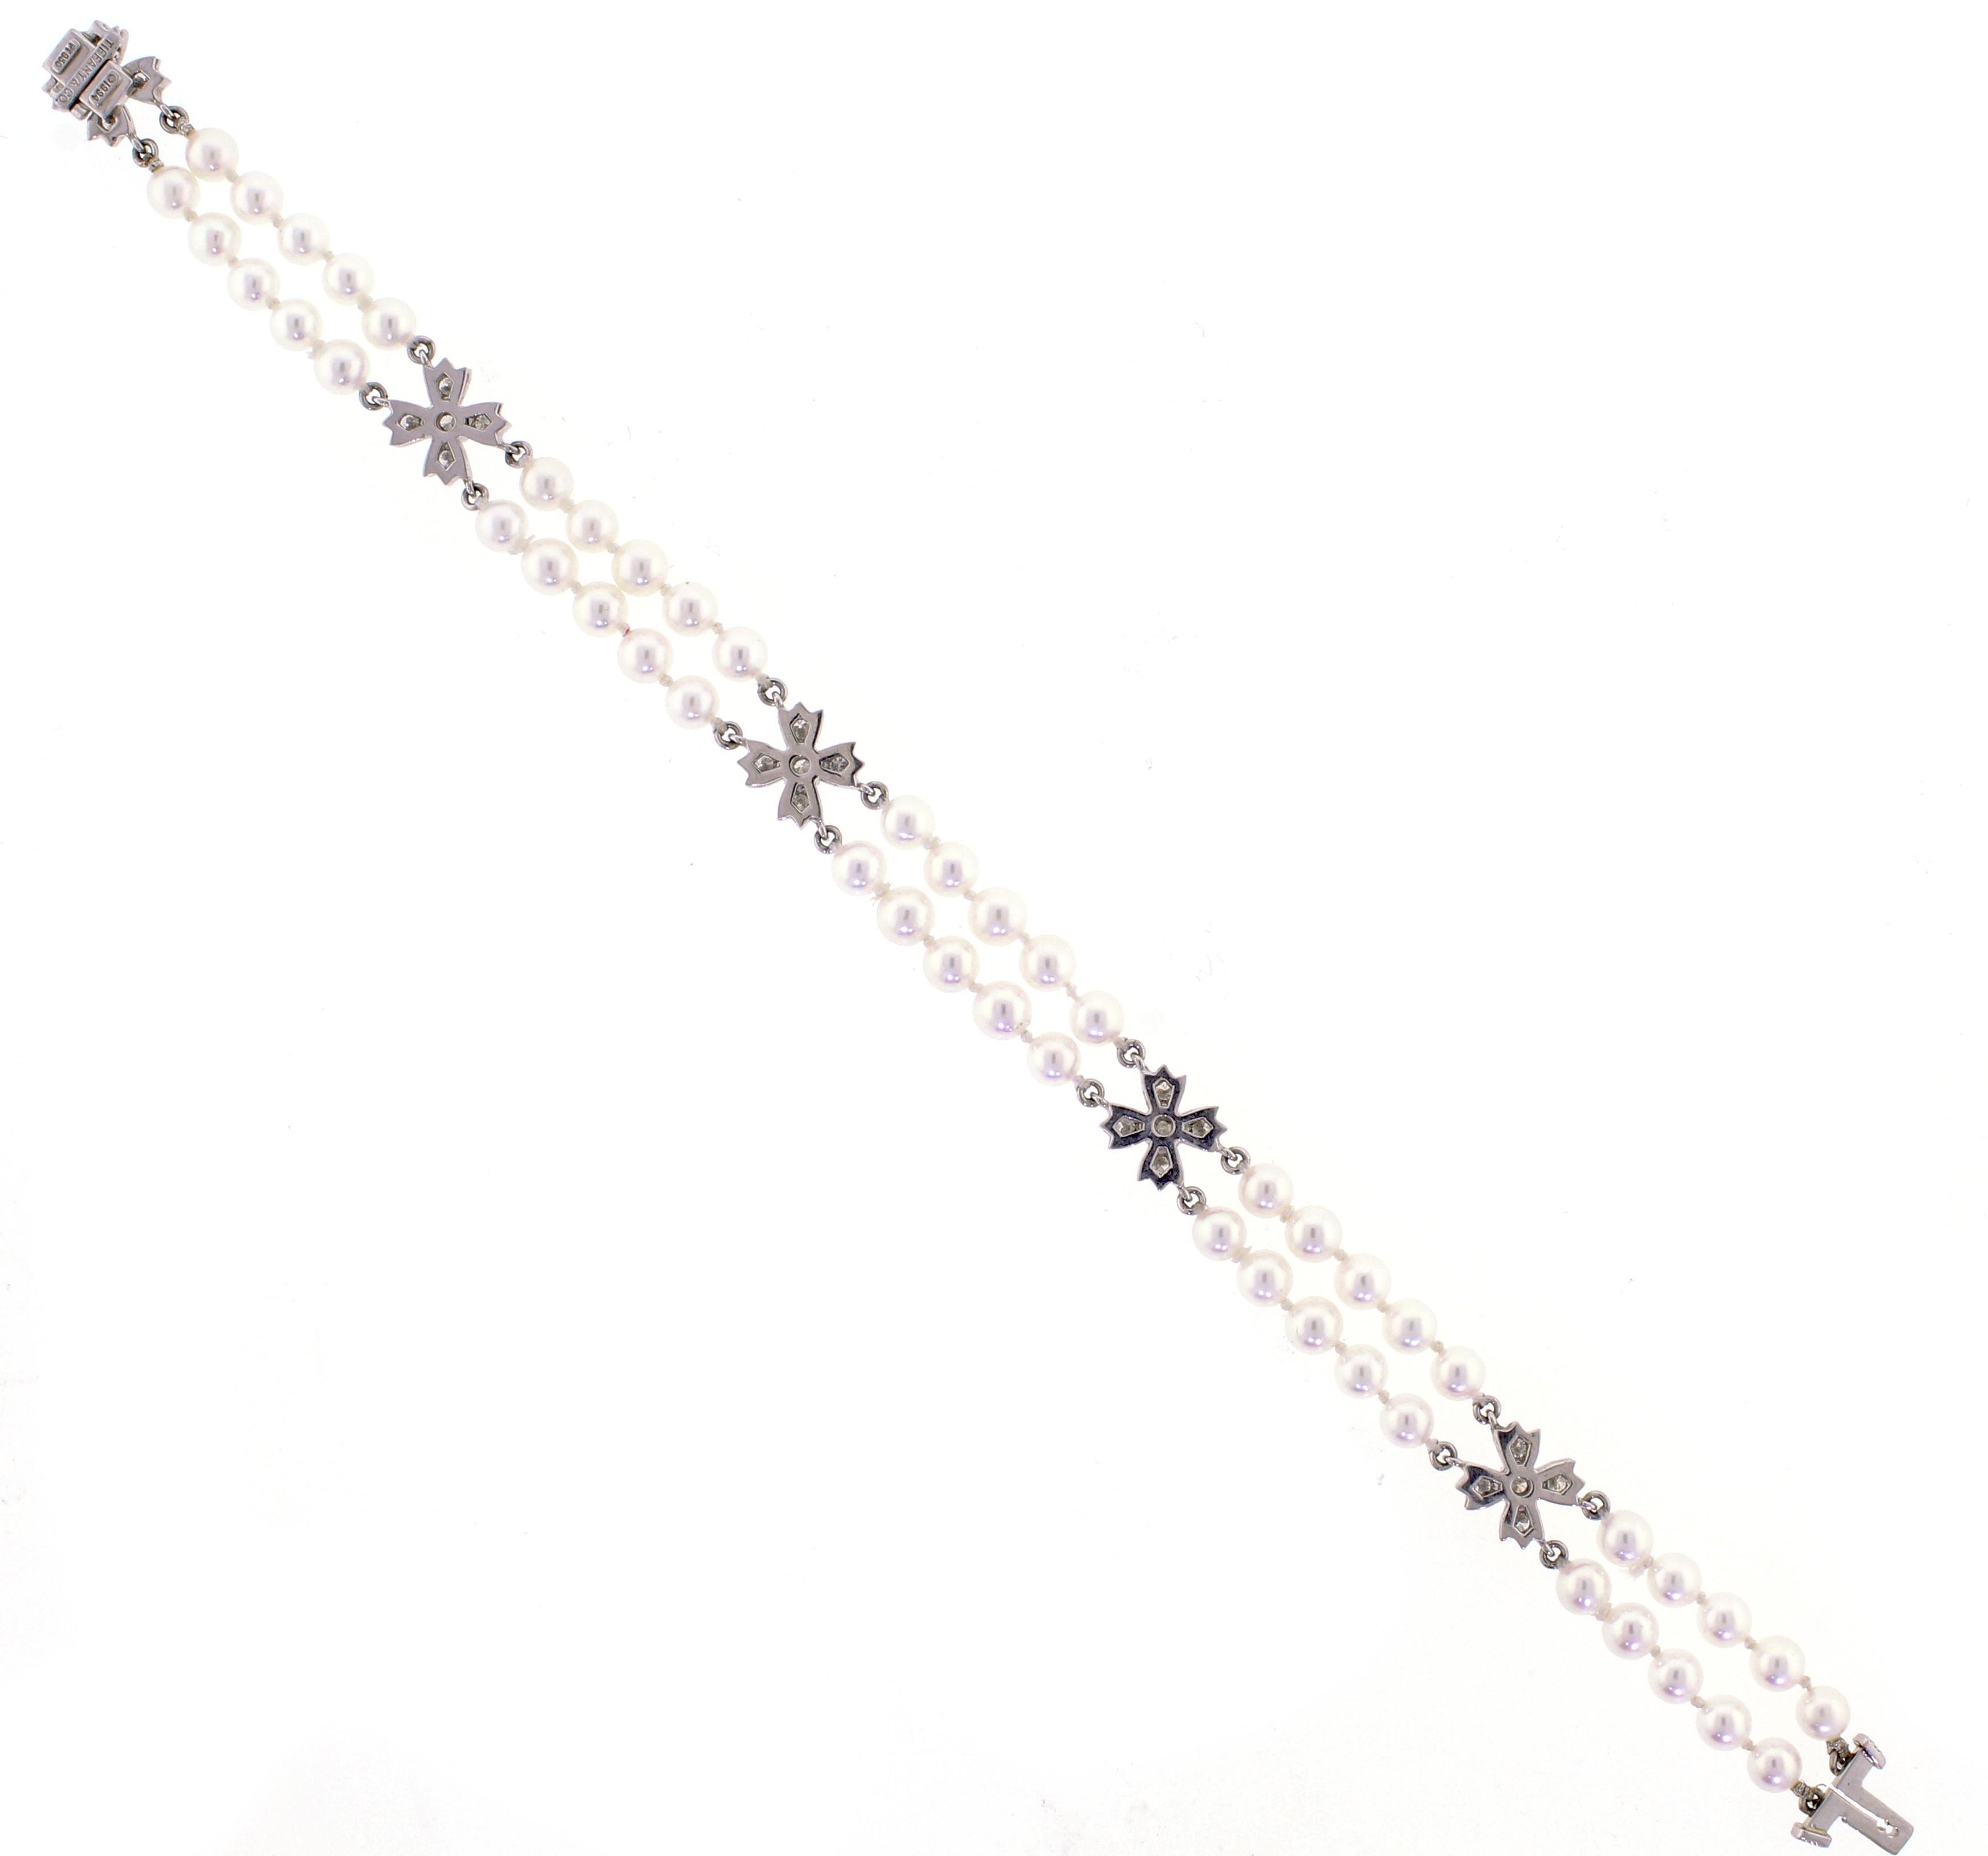 4e408a9f8 Tiffany and Co. Floret Flourishes Diamond Platinum Pearl Bracelet at 1stdibs